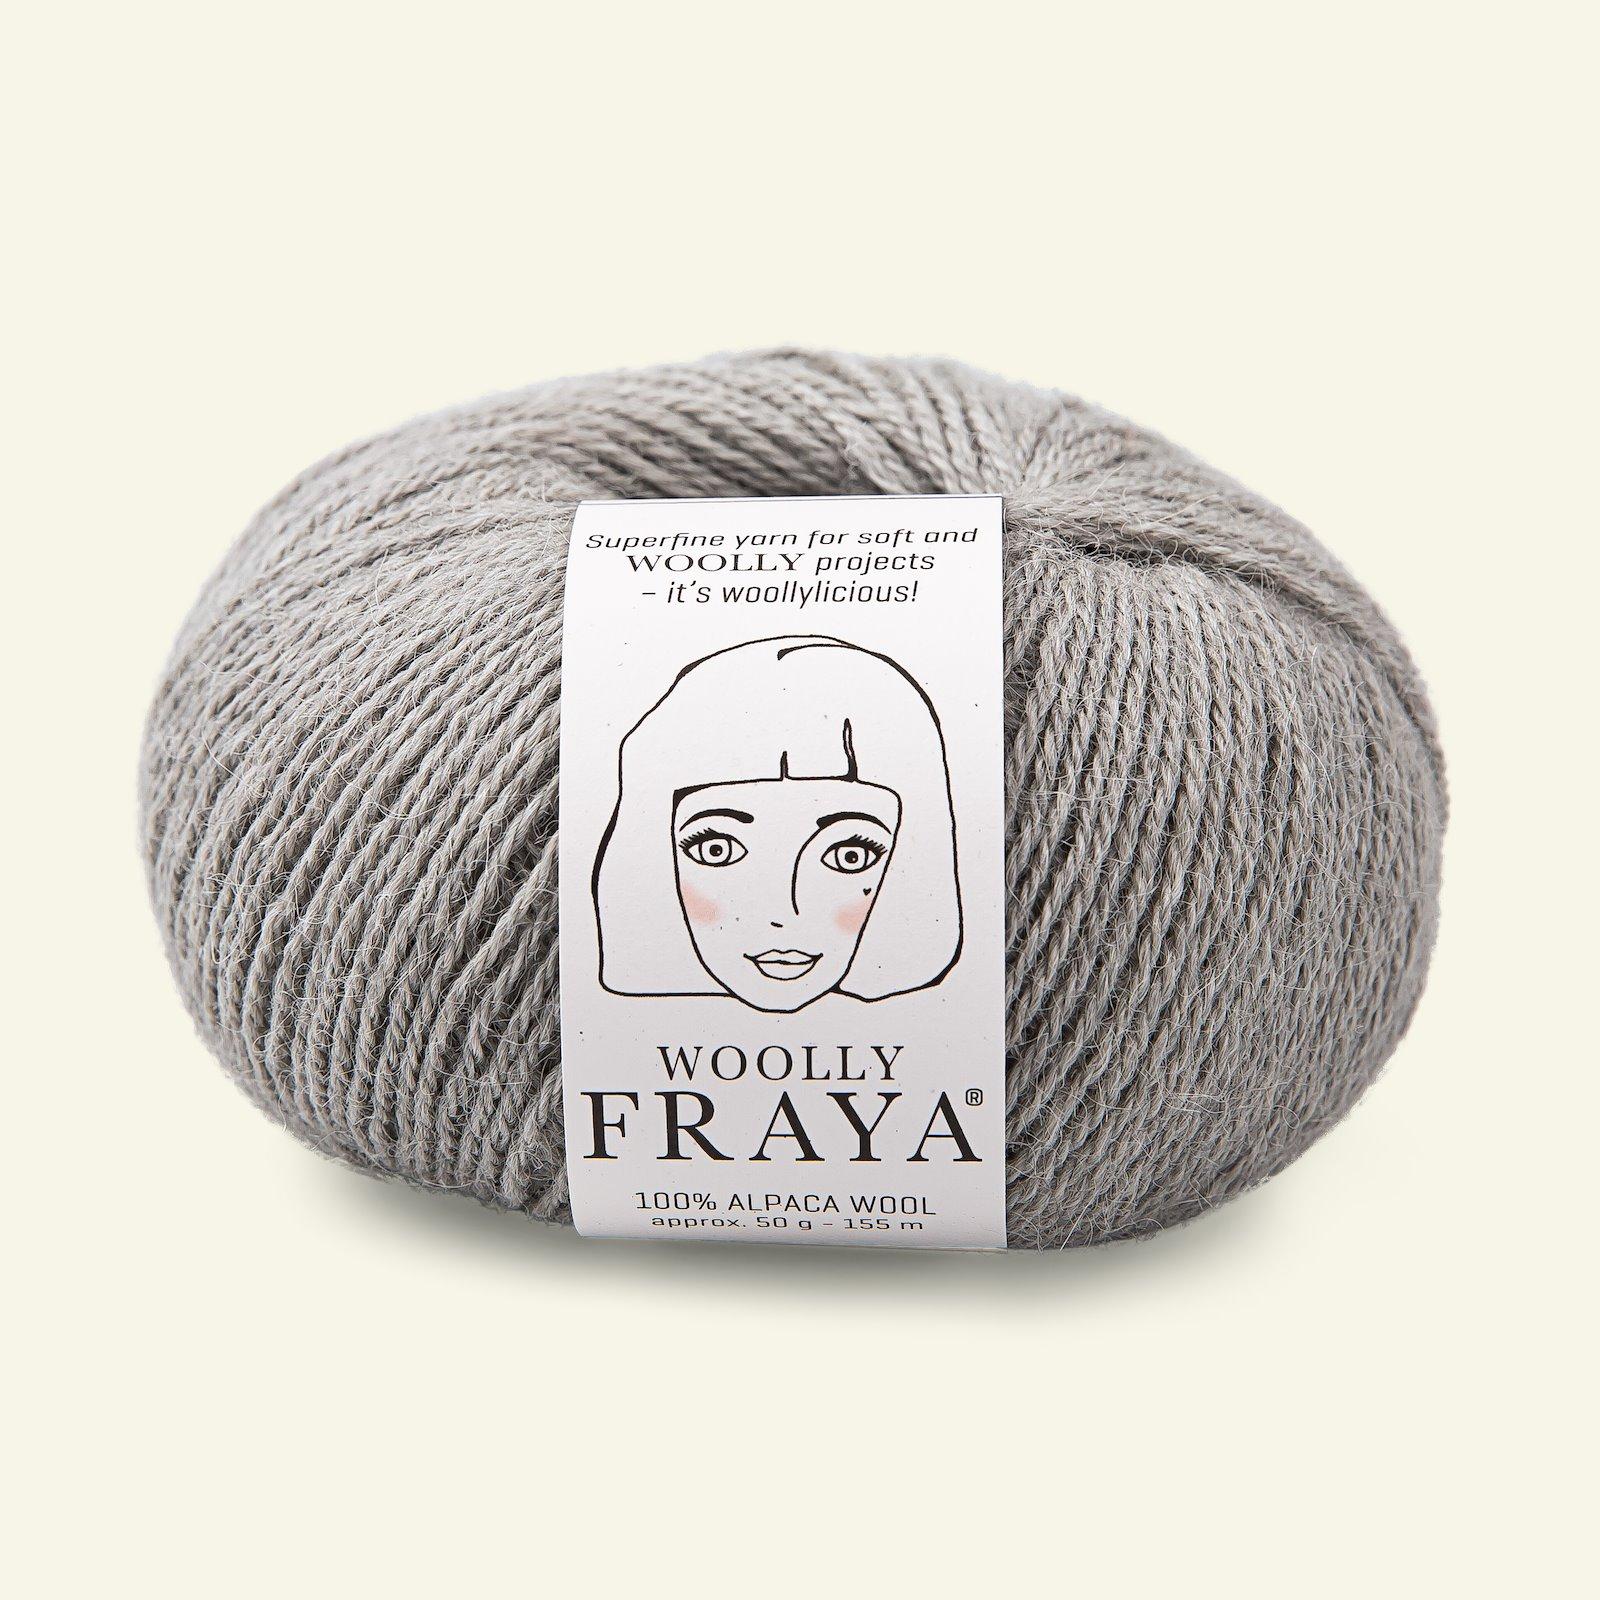 Woolly 50g light grey 90000071_pack